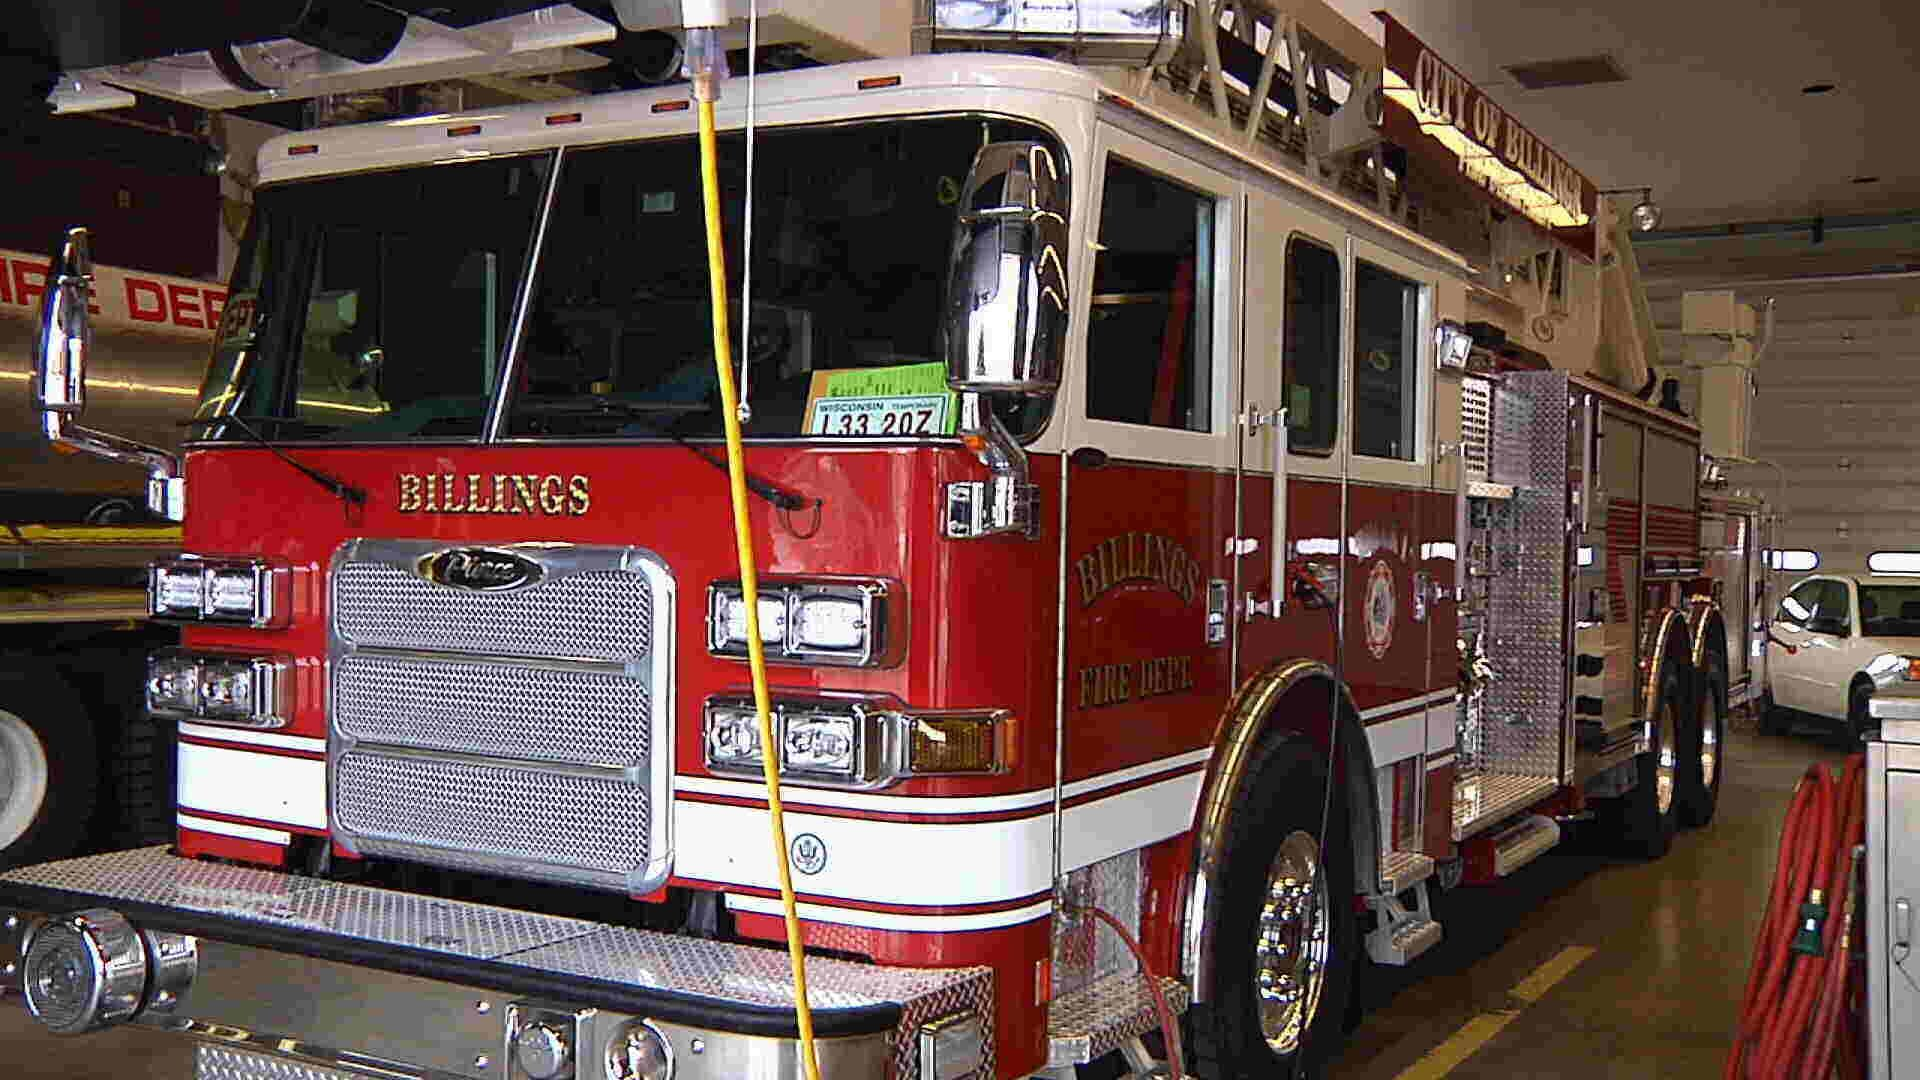 Billings Logan International Airport Fire Department ...